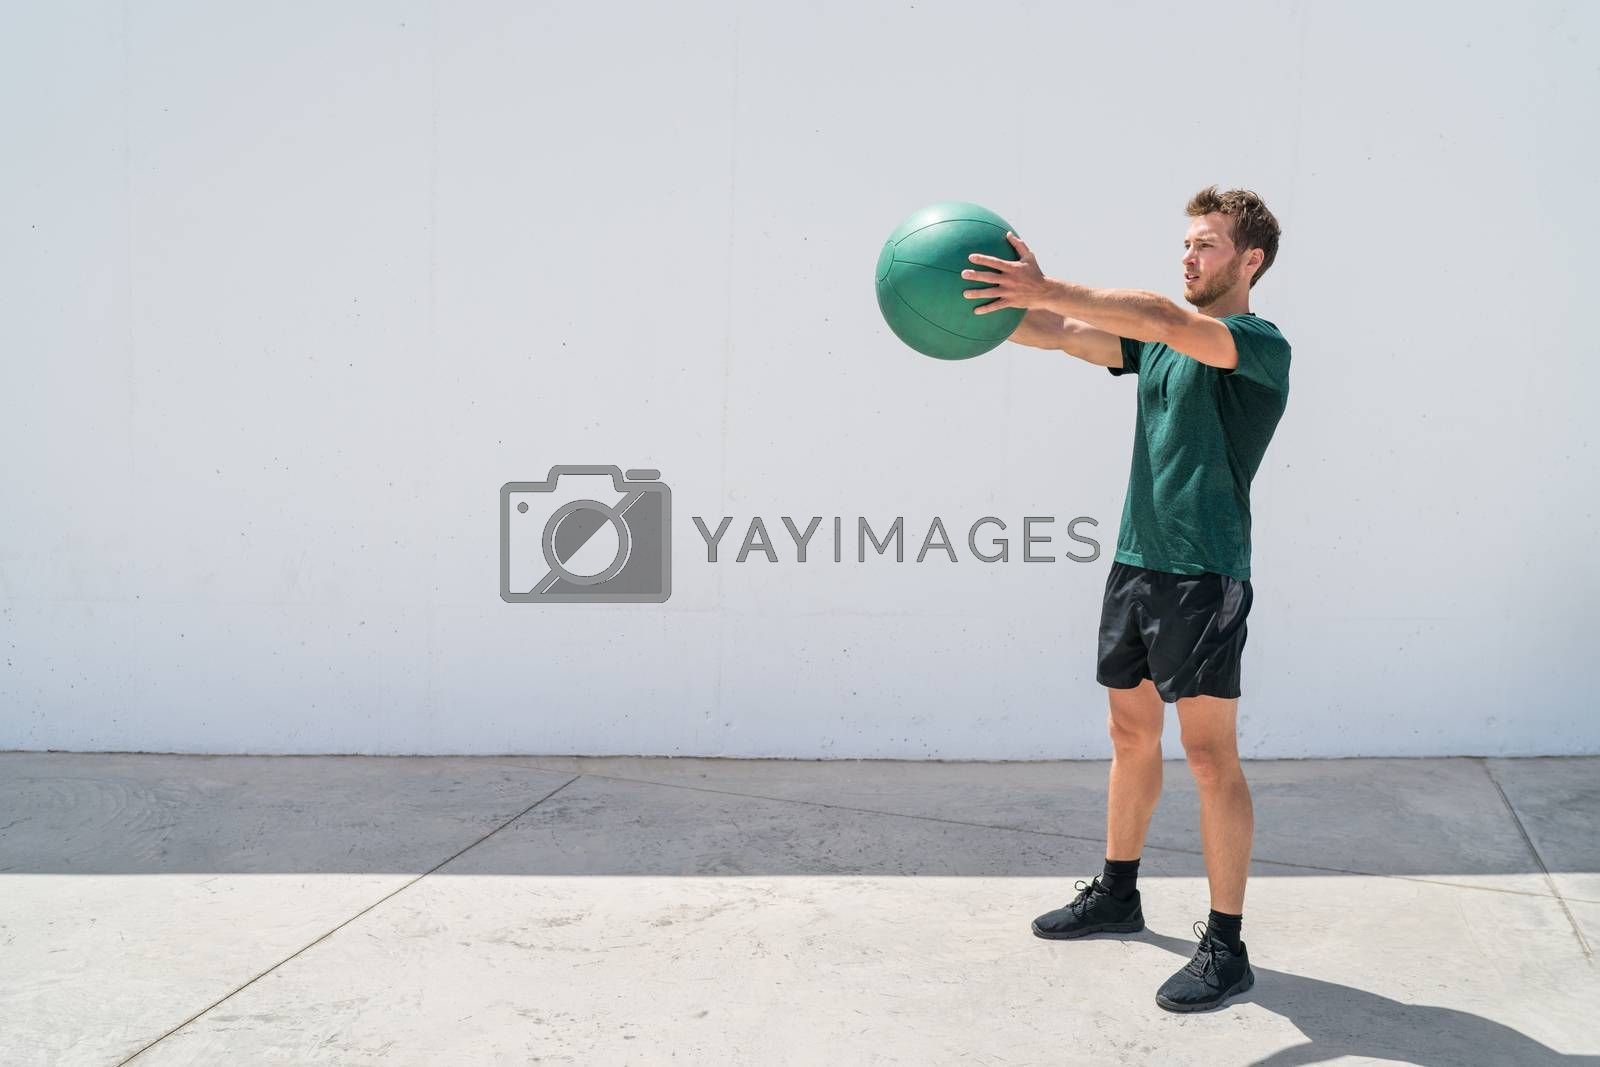 Medicine ball workout fitness man training arms by Maridav